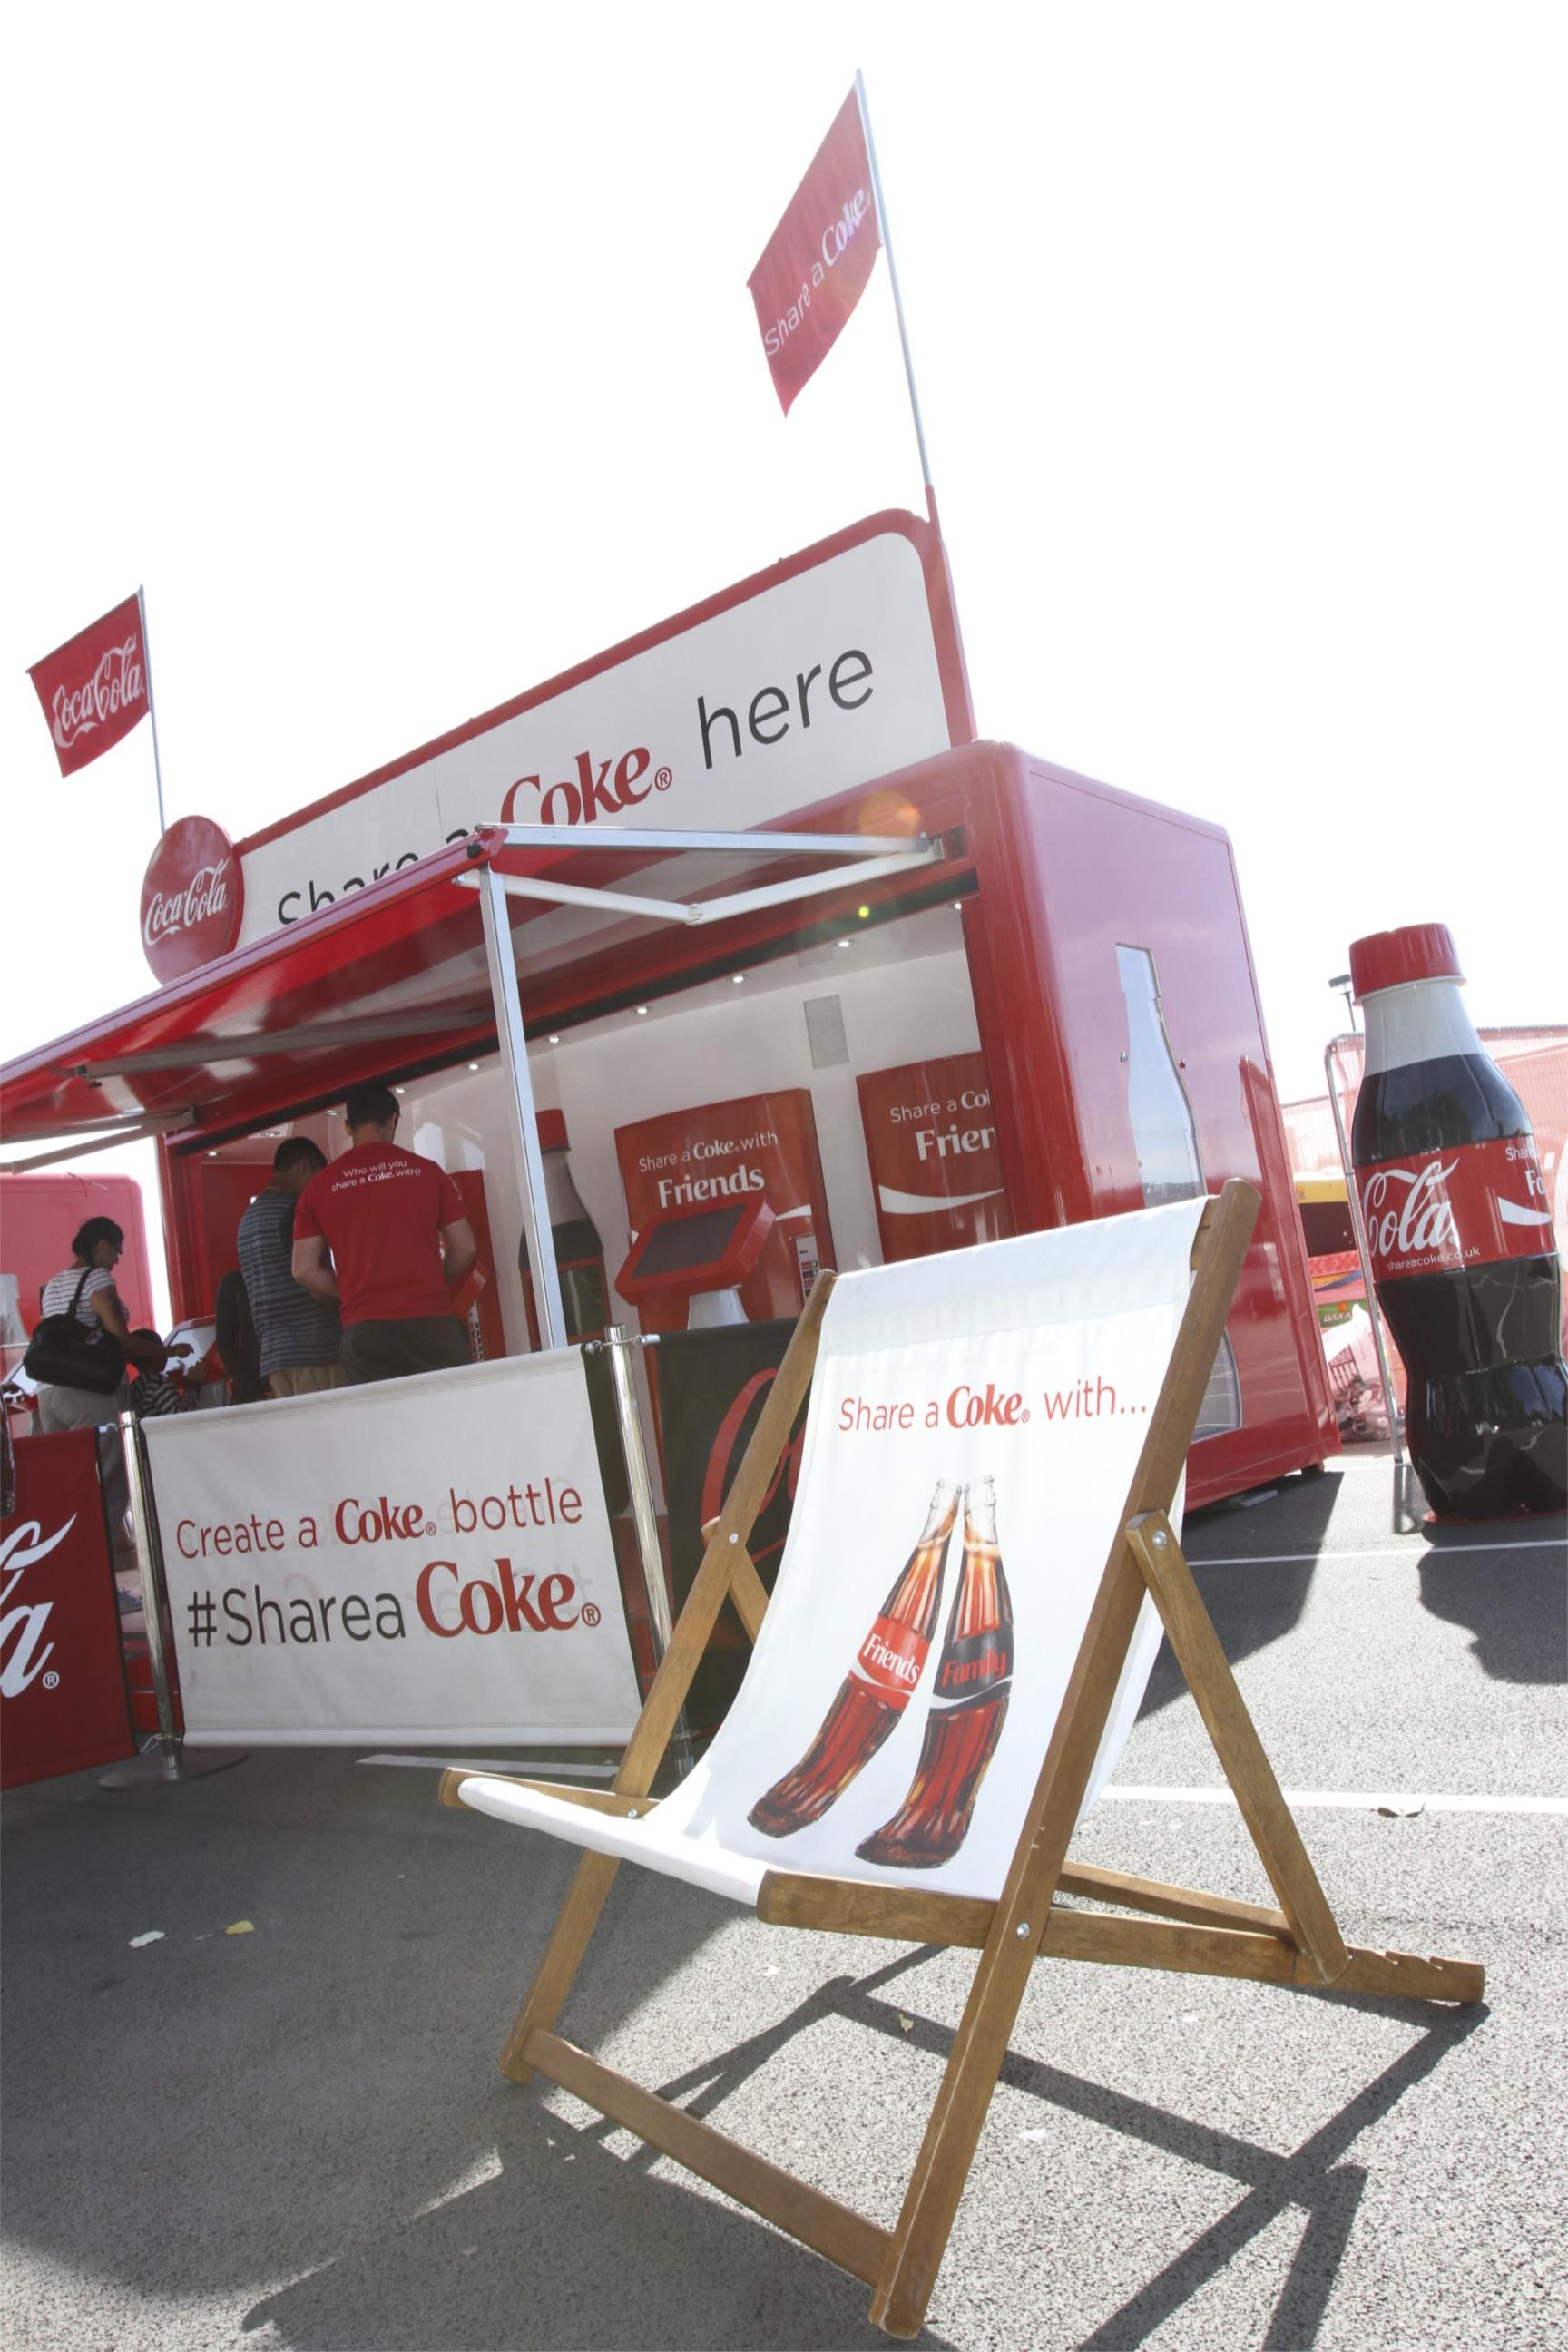 HEART Event Design share a coke london